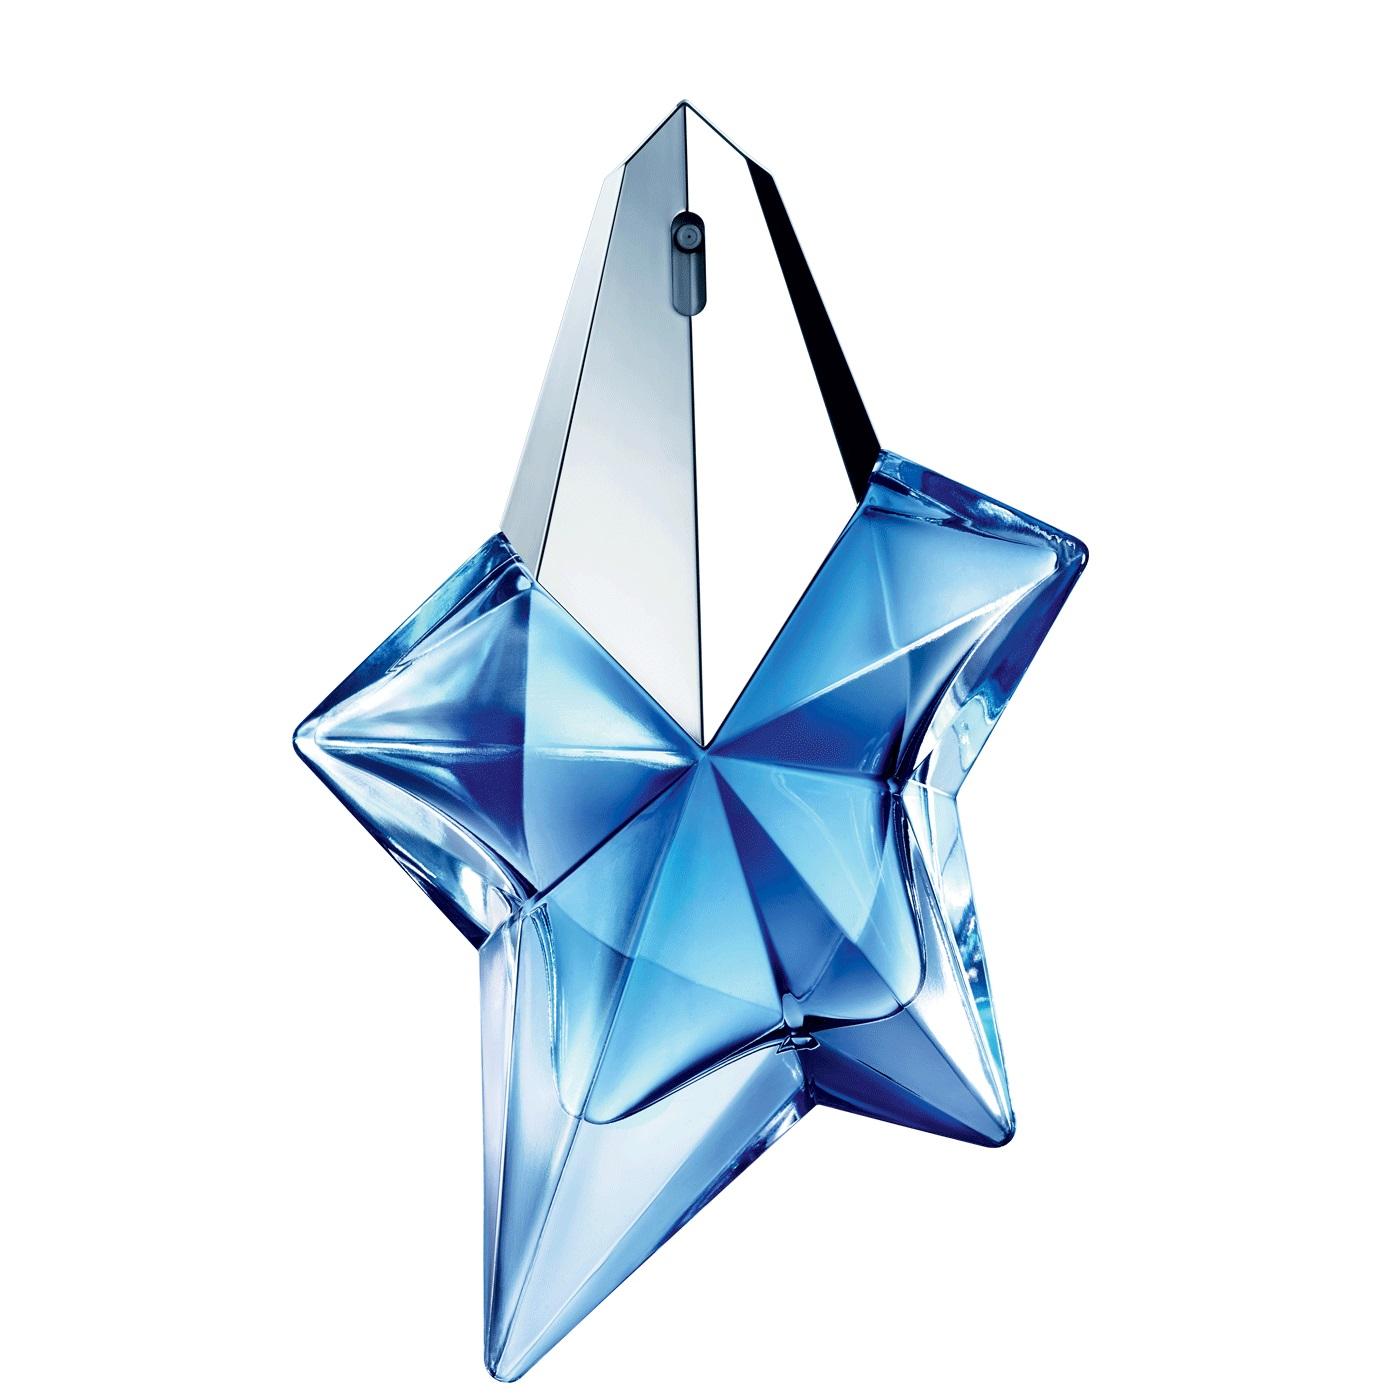 Angel Perfume (Refillable) for Women <b>25ml</b> Eau De Parfum  (EDP) by <b>Thierry Mugler</b>